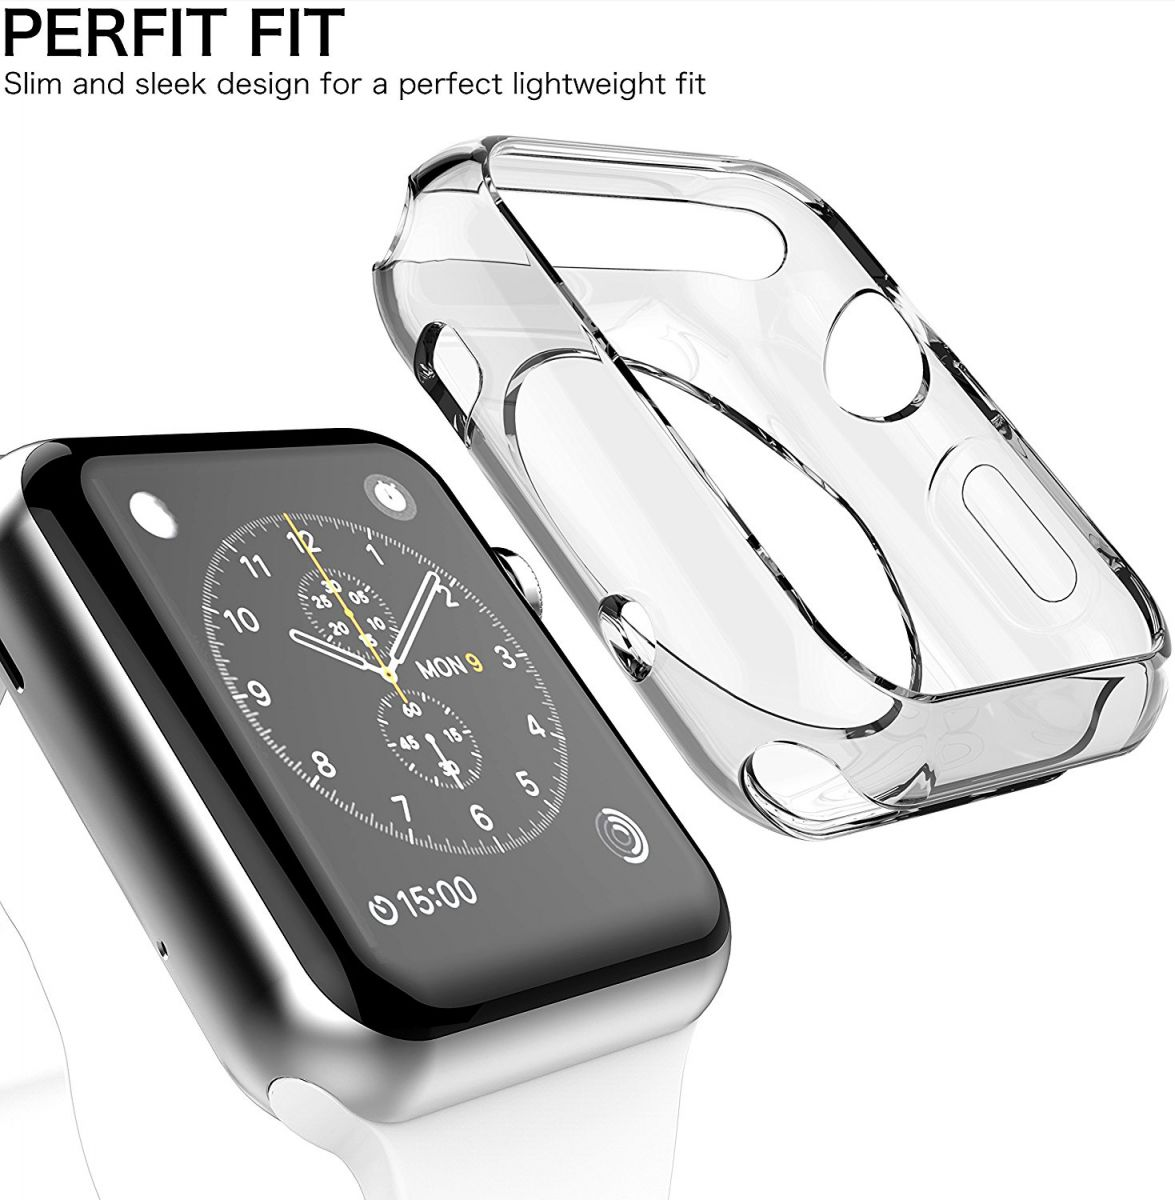 Obal / Kryt na hodinky Apple Watch.